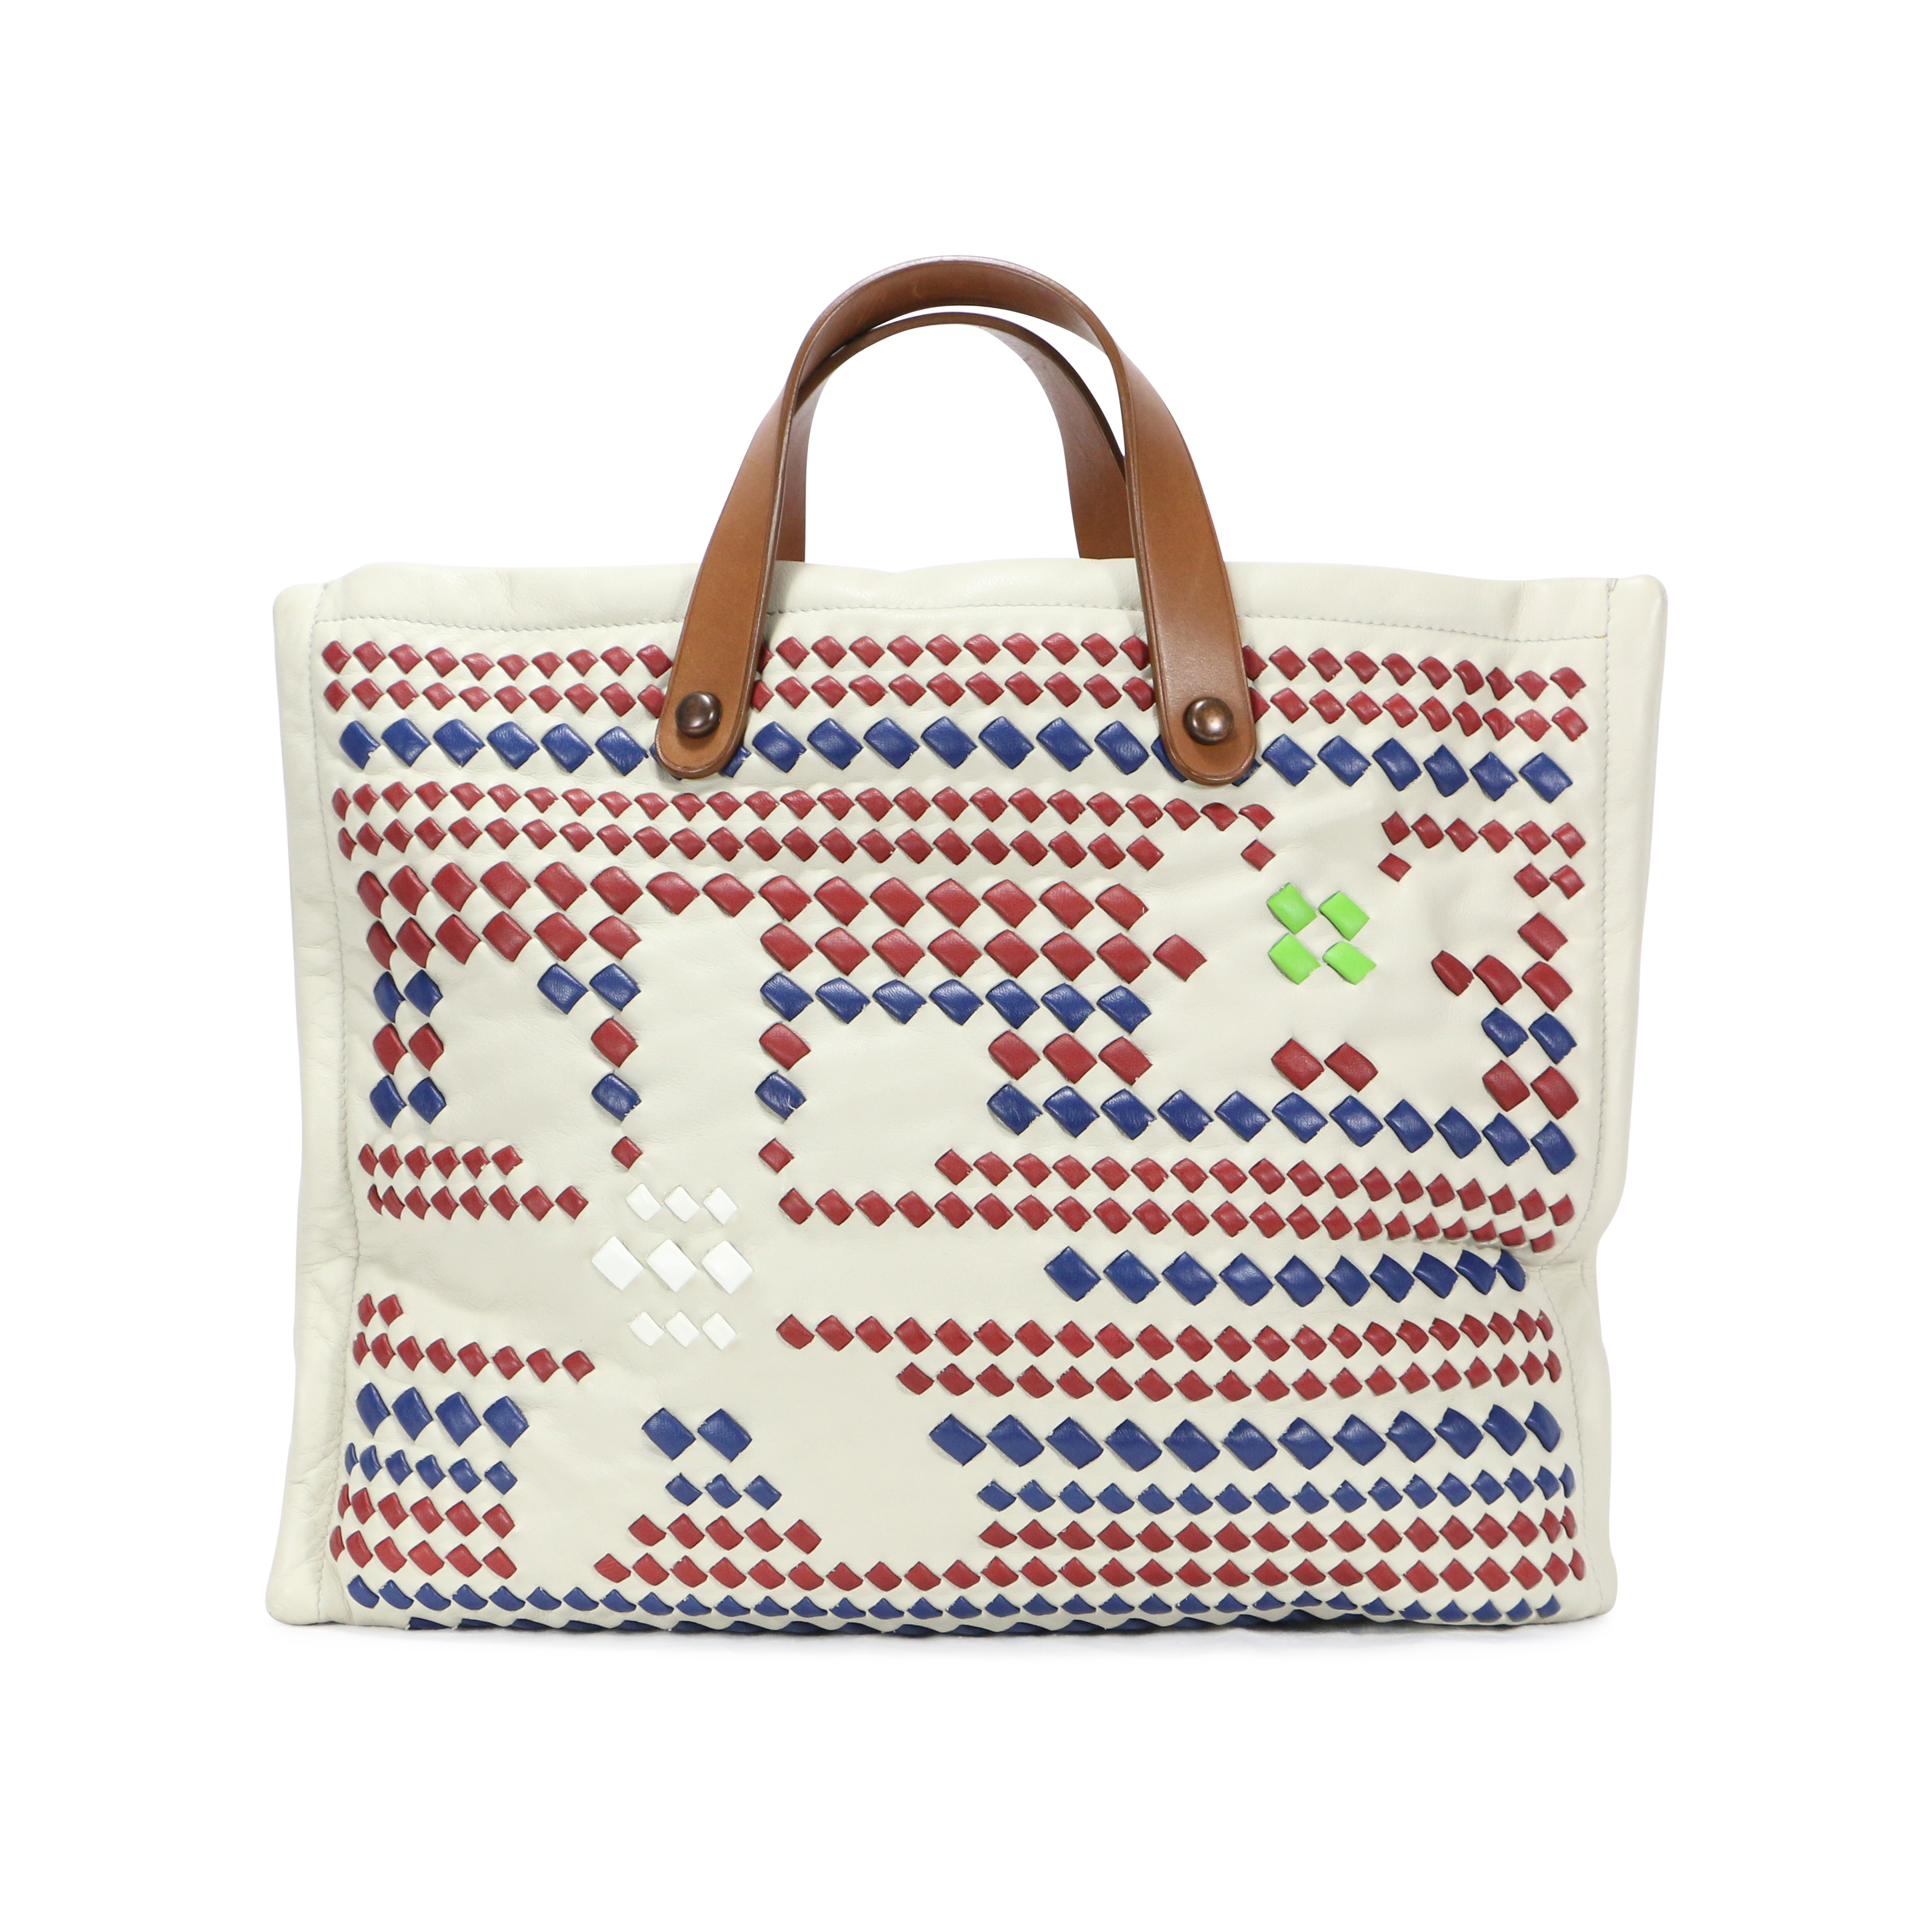 4f873f0e52 Authentic Second Hand Bottega Veneta Woven Flower Tote Bag (PSS-200-00297)